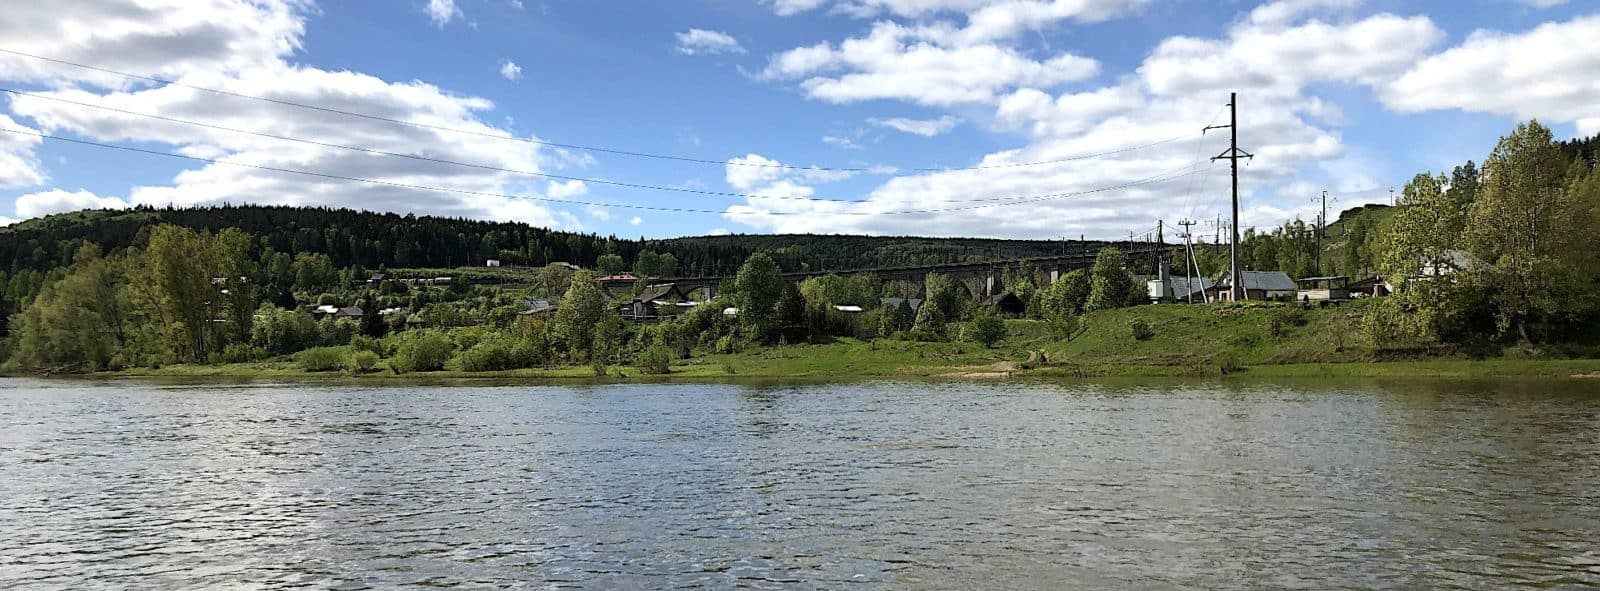 Мост в Рябиновке